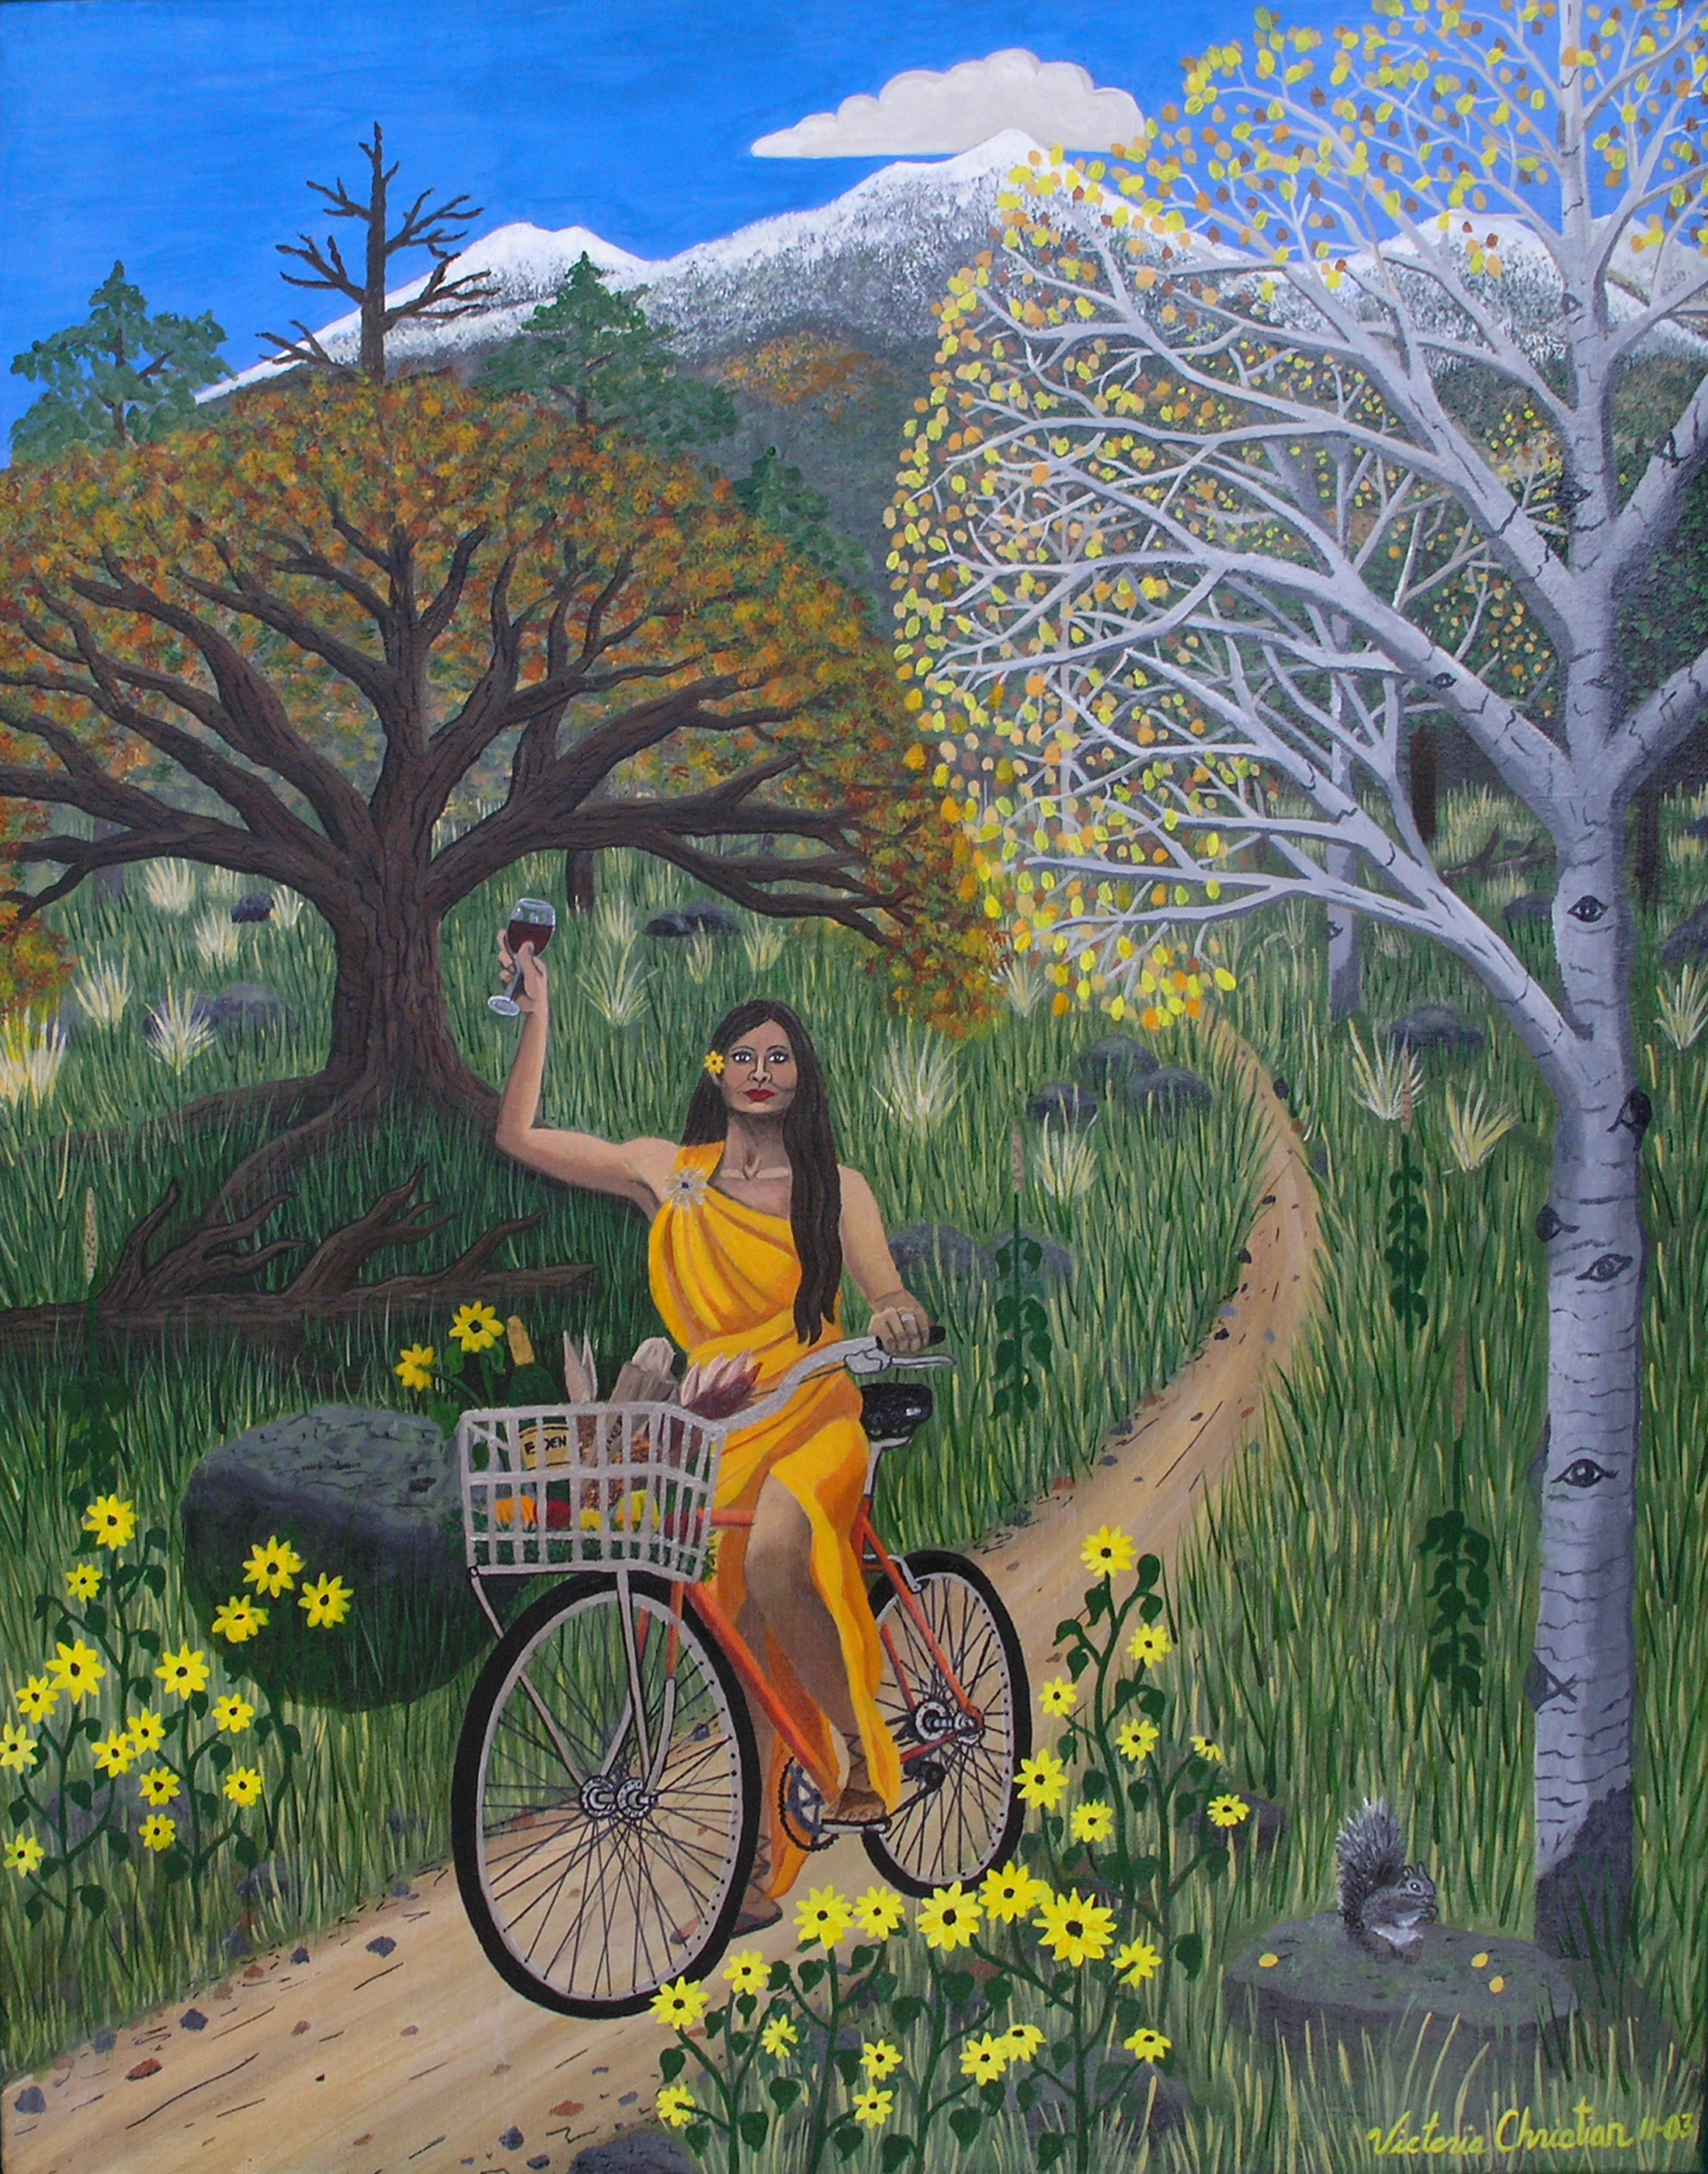 Flagstaff Biking Goddess